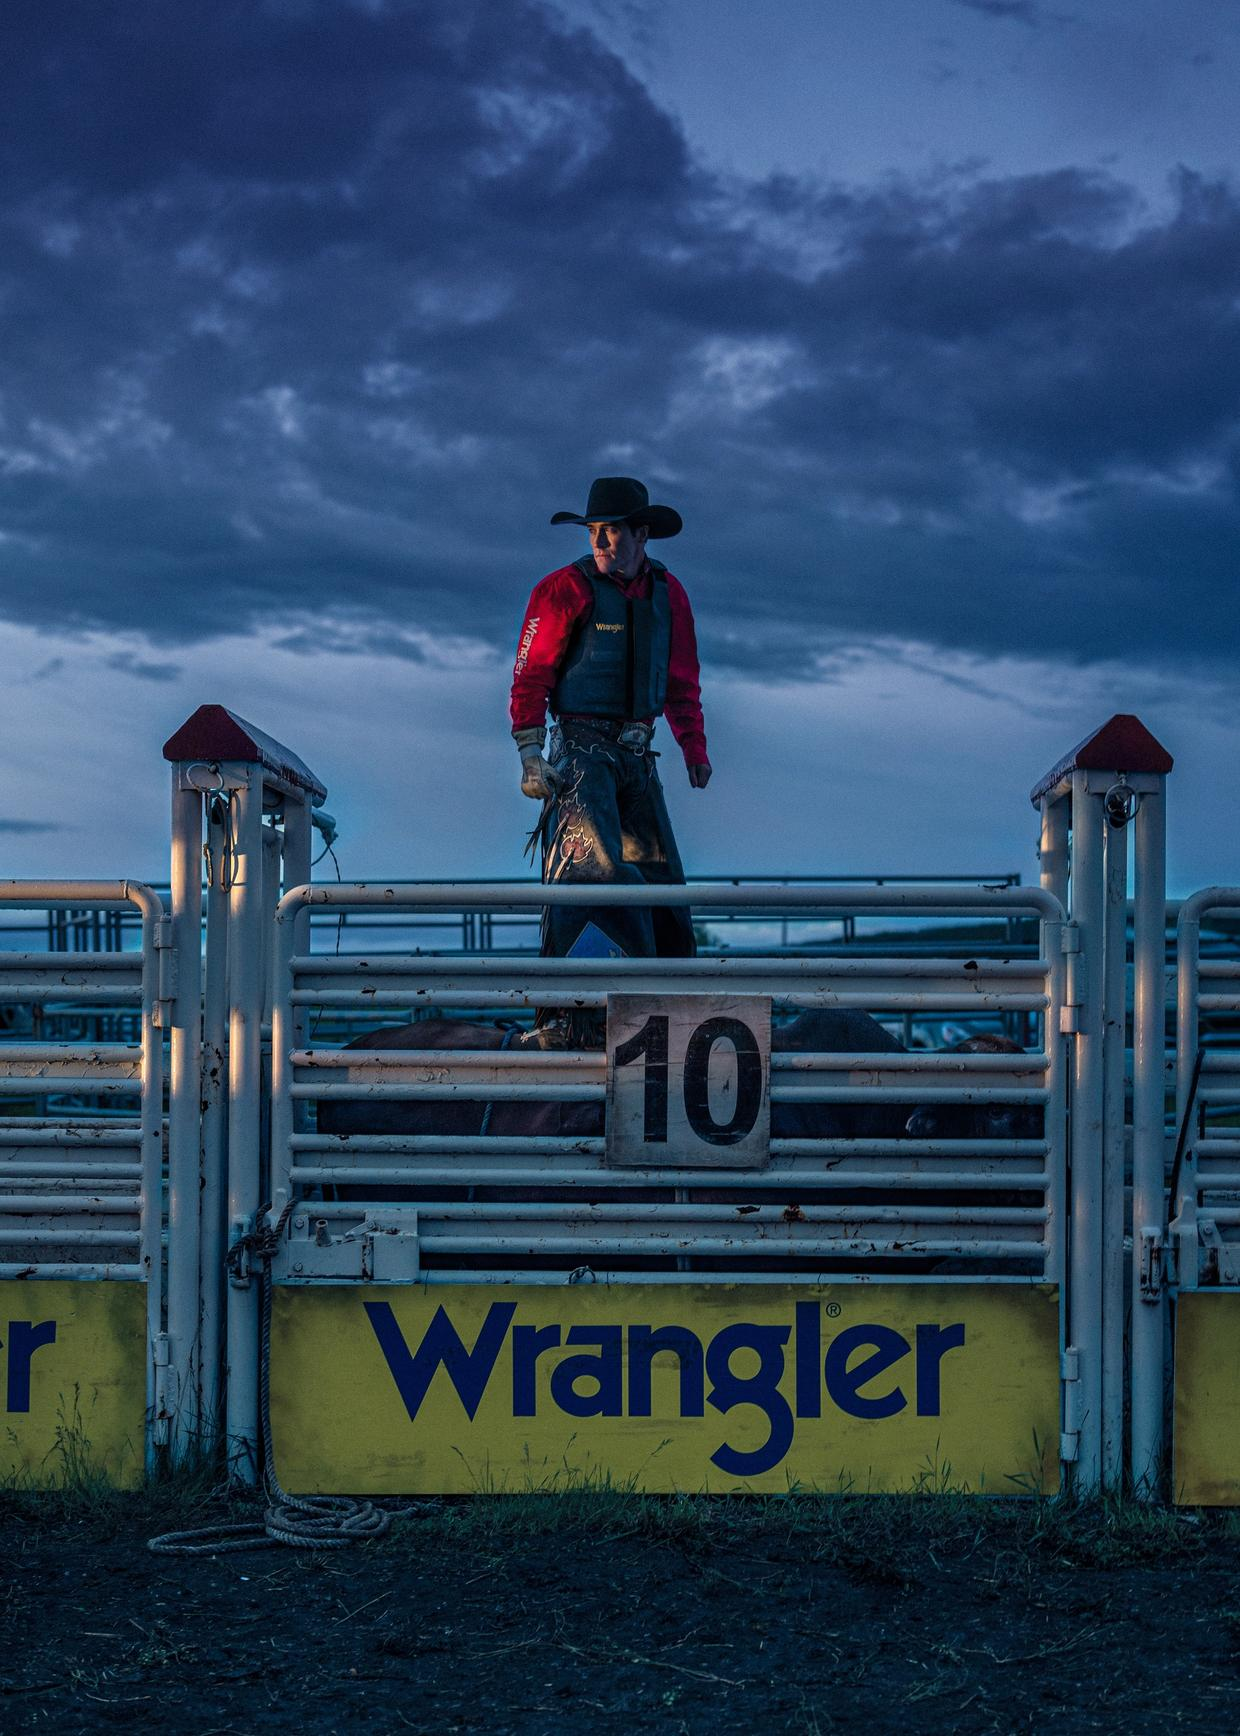 Wrangler - Bullrider